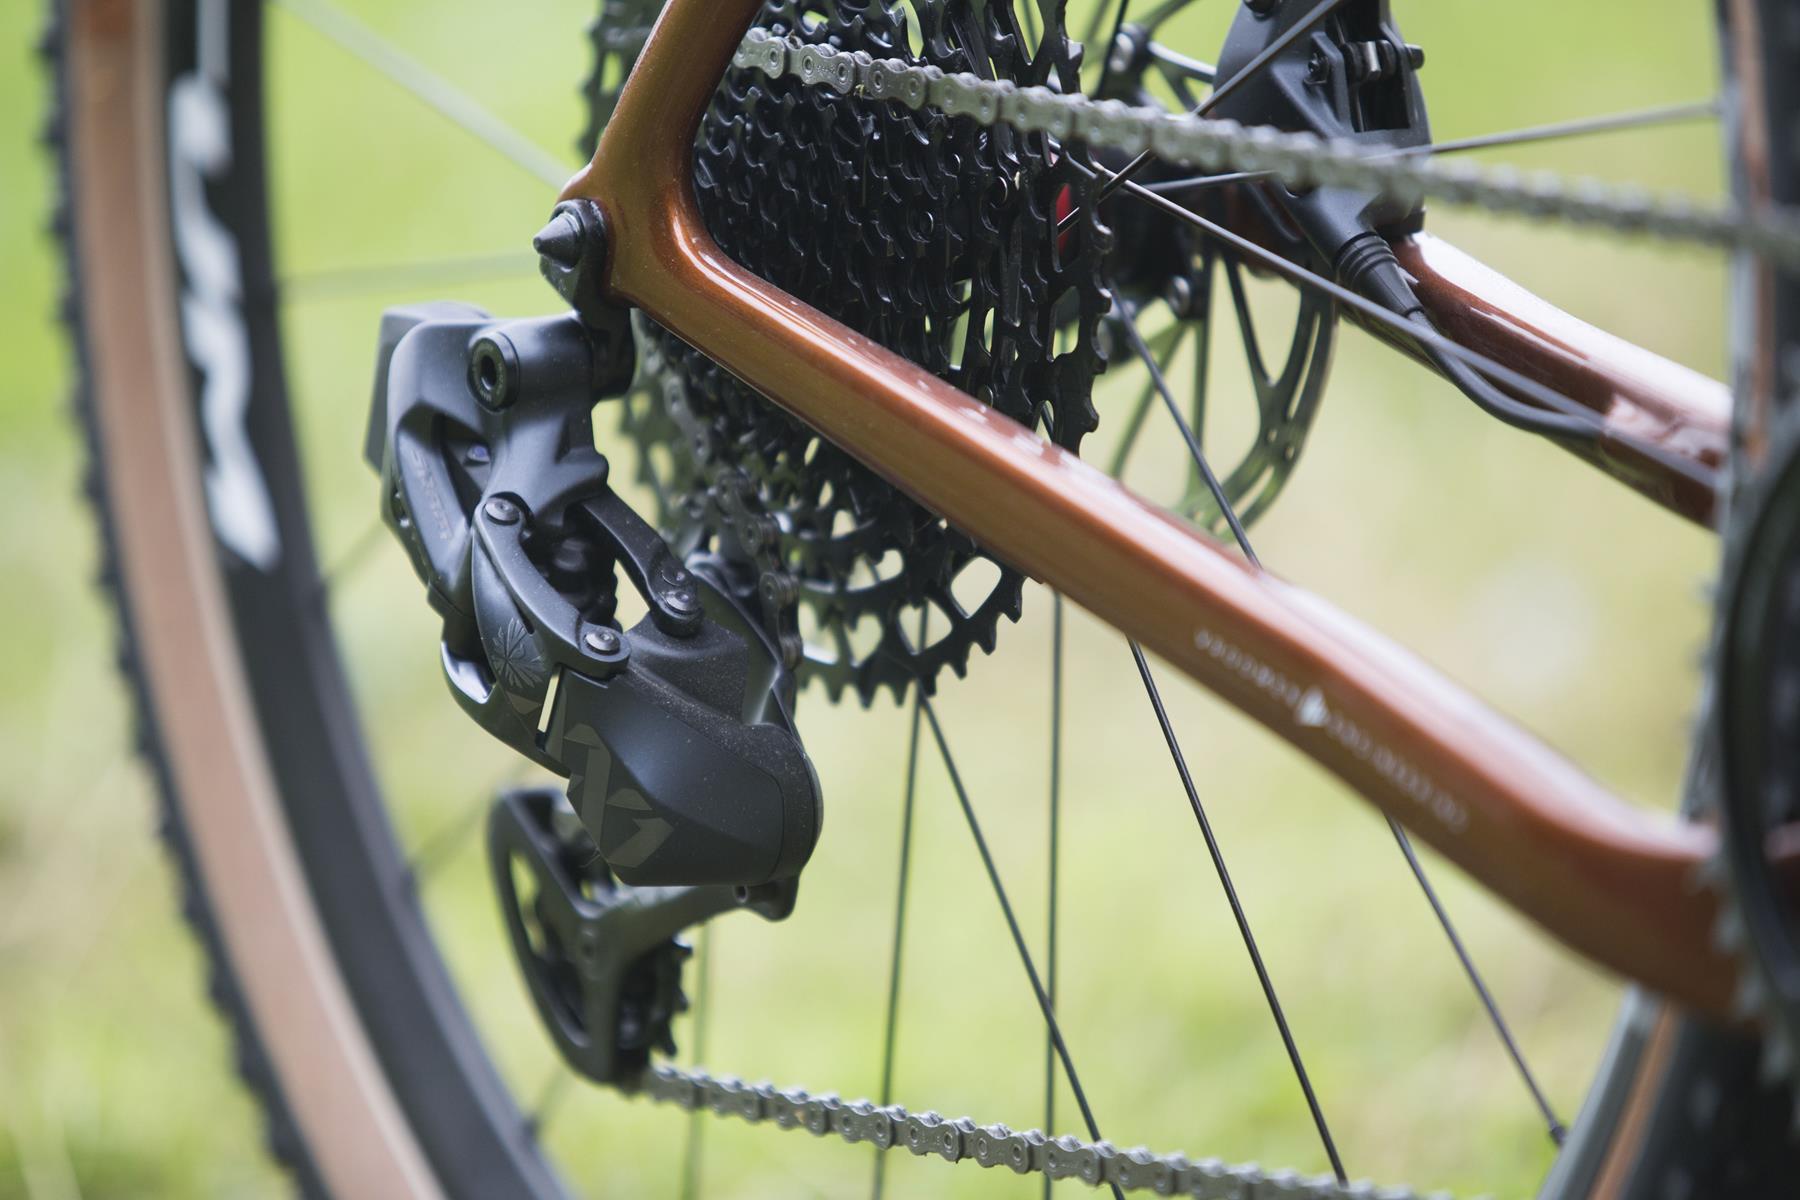 gravel_bicikl4.jpg (173 KB)